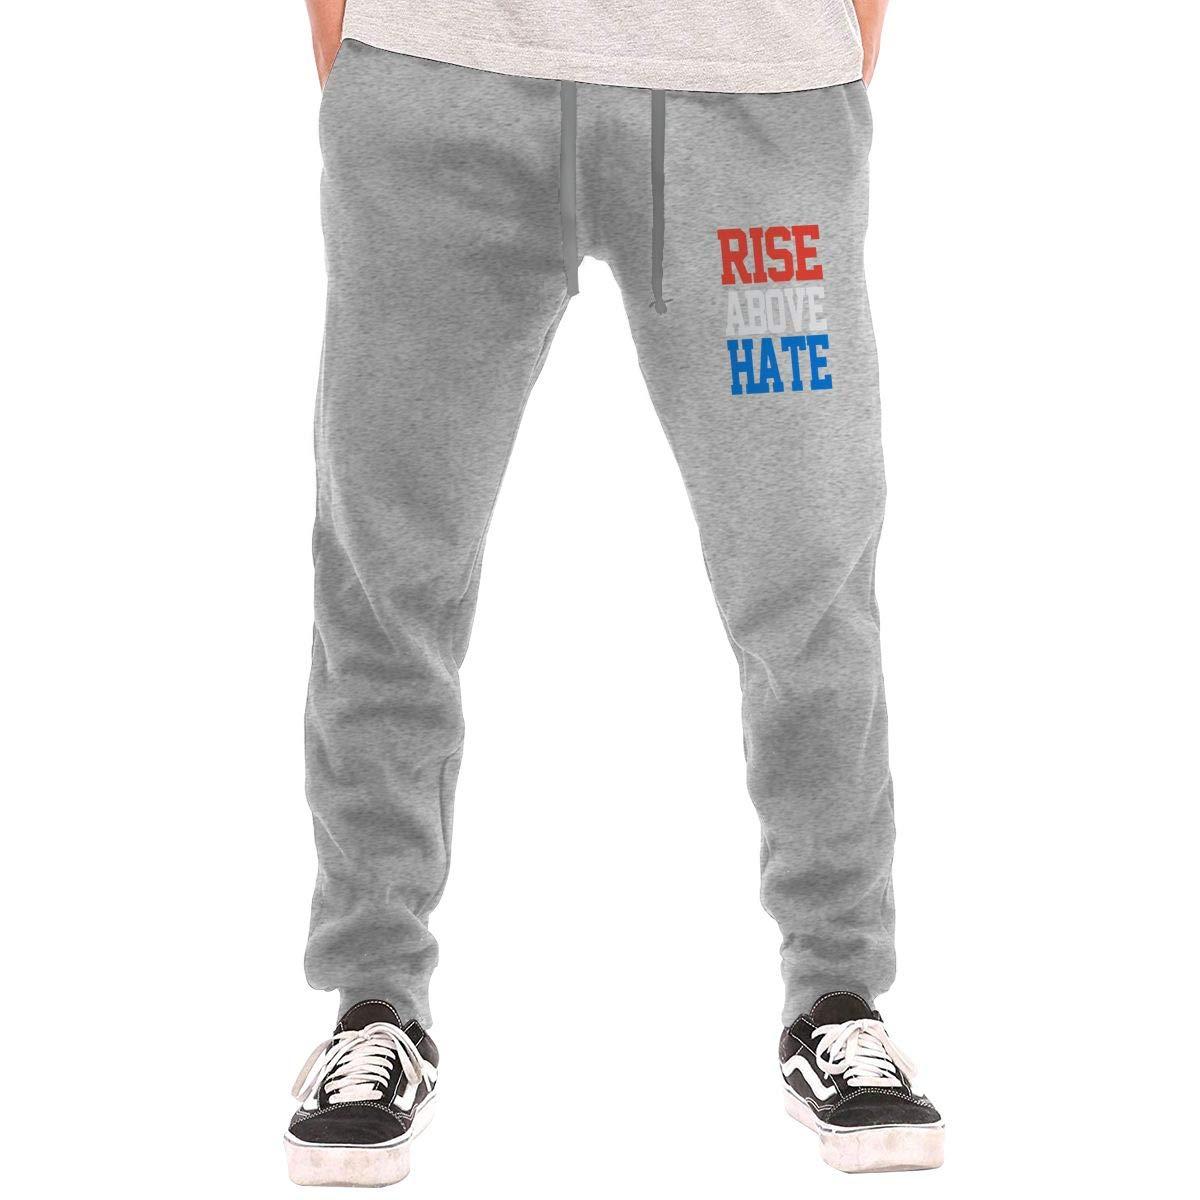 Rise Above Hate Drawstring Waist,100/% Cotton,Elastic Waist Cuffed,Jogger Sweatpants Black